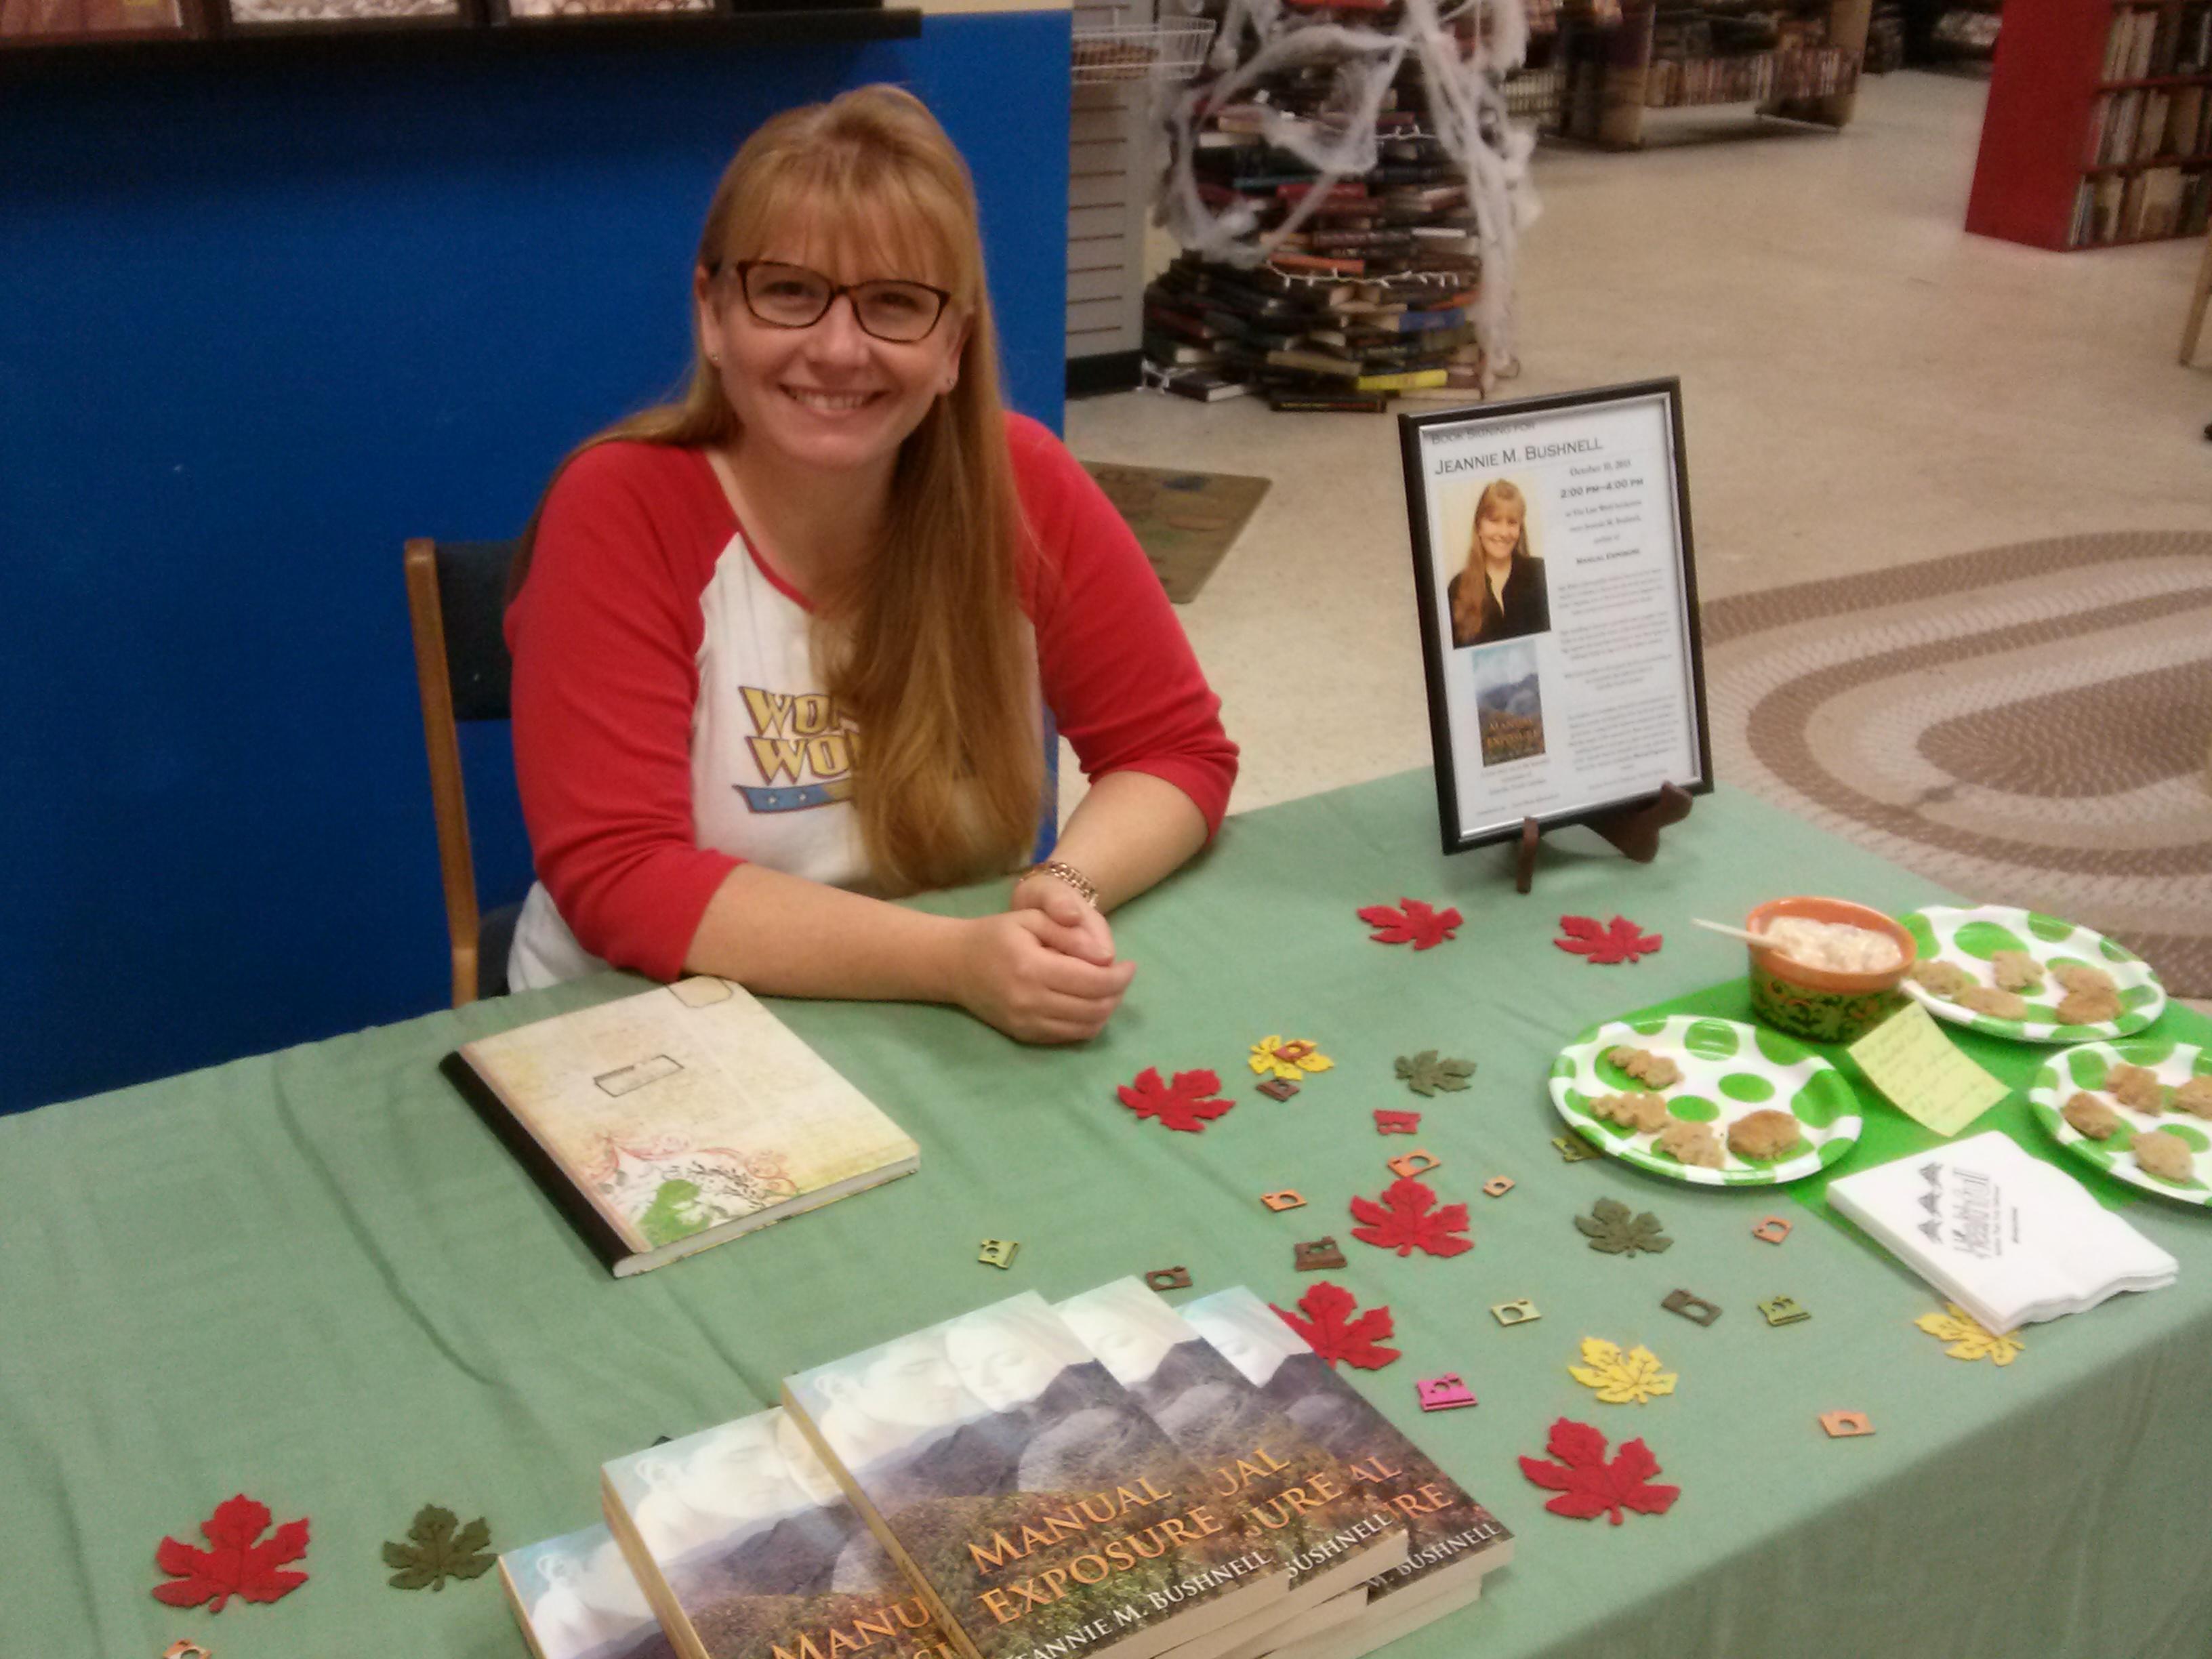 jeannie m bushnell book signing